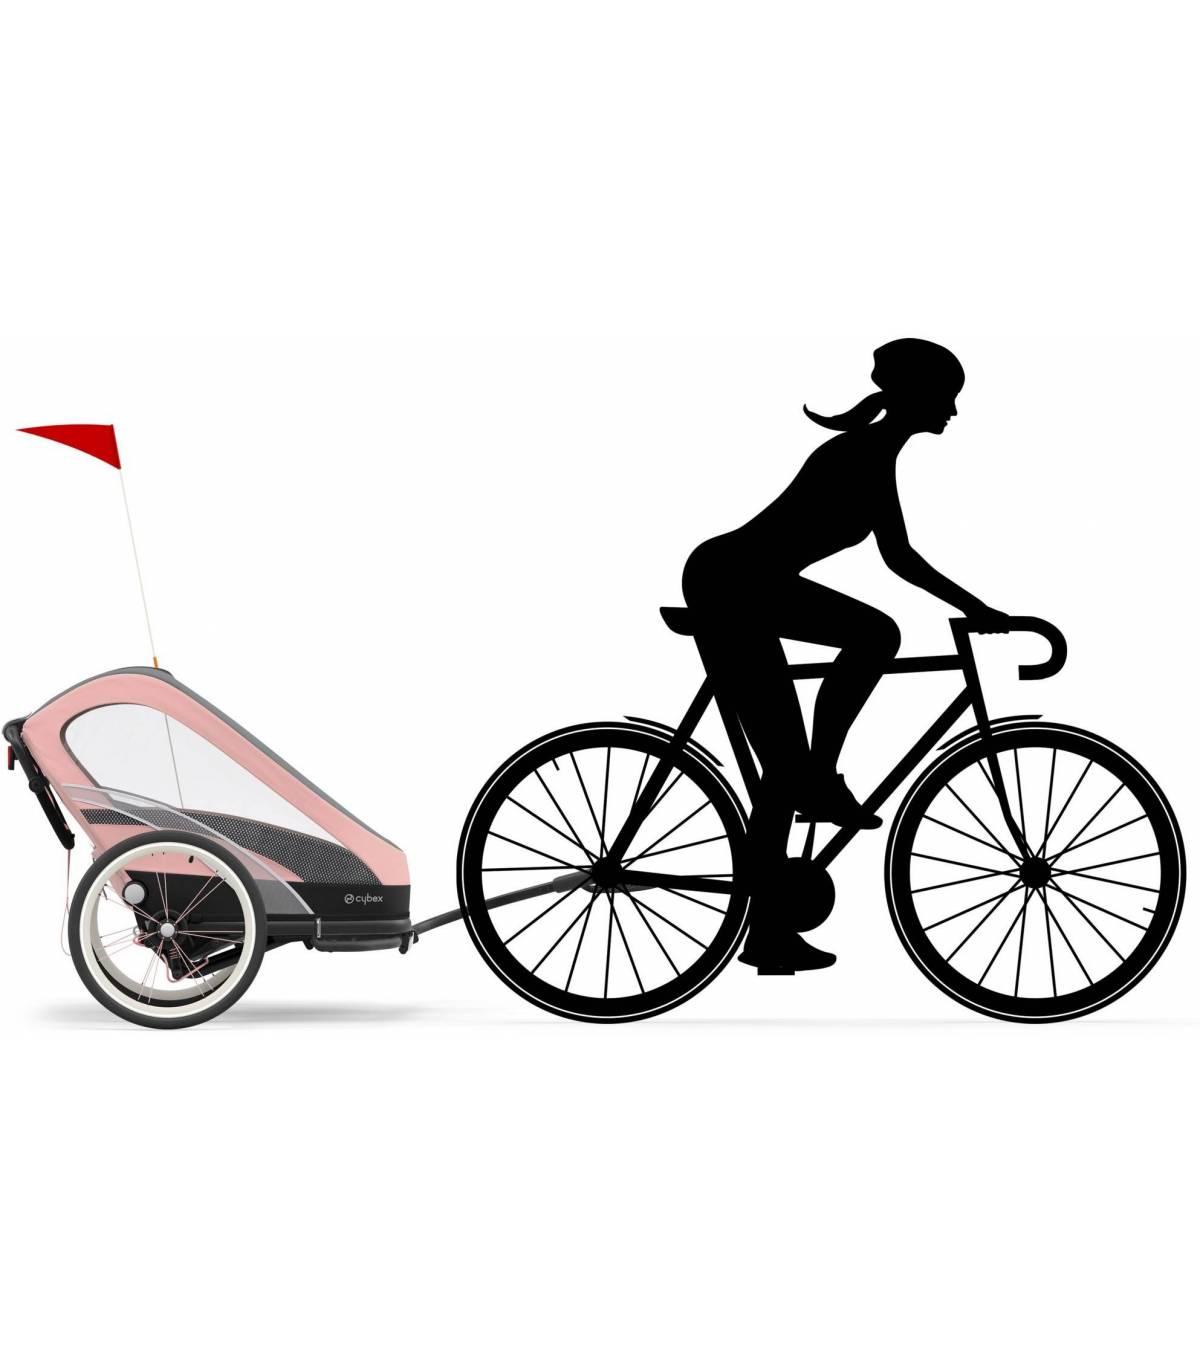 Cybex ZENO Cycling Kit